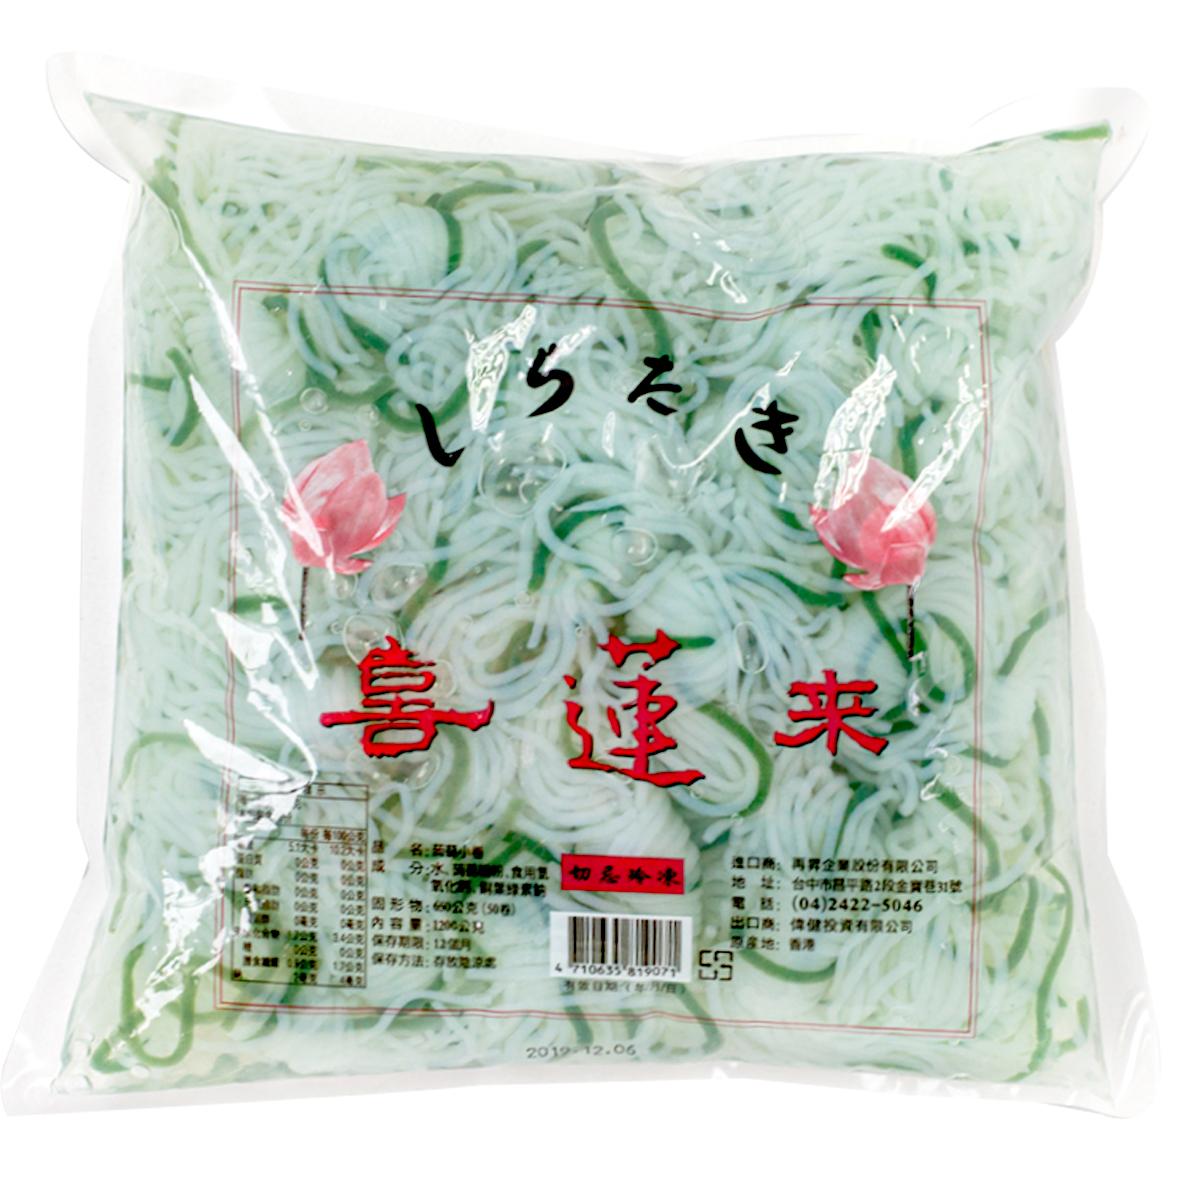 Image Konjac noodle rolls 旭家- 蒟蒻小卷